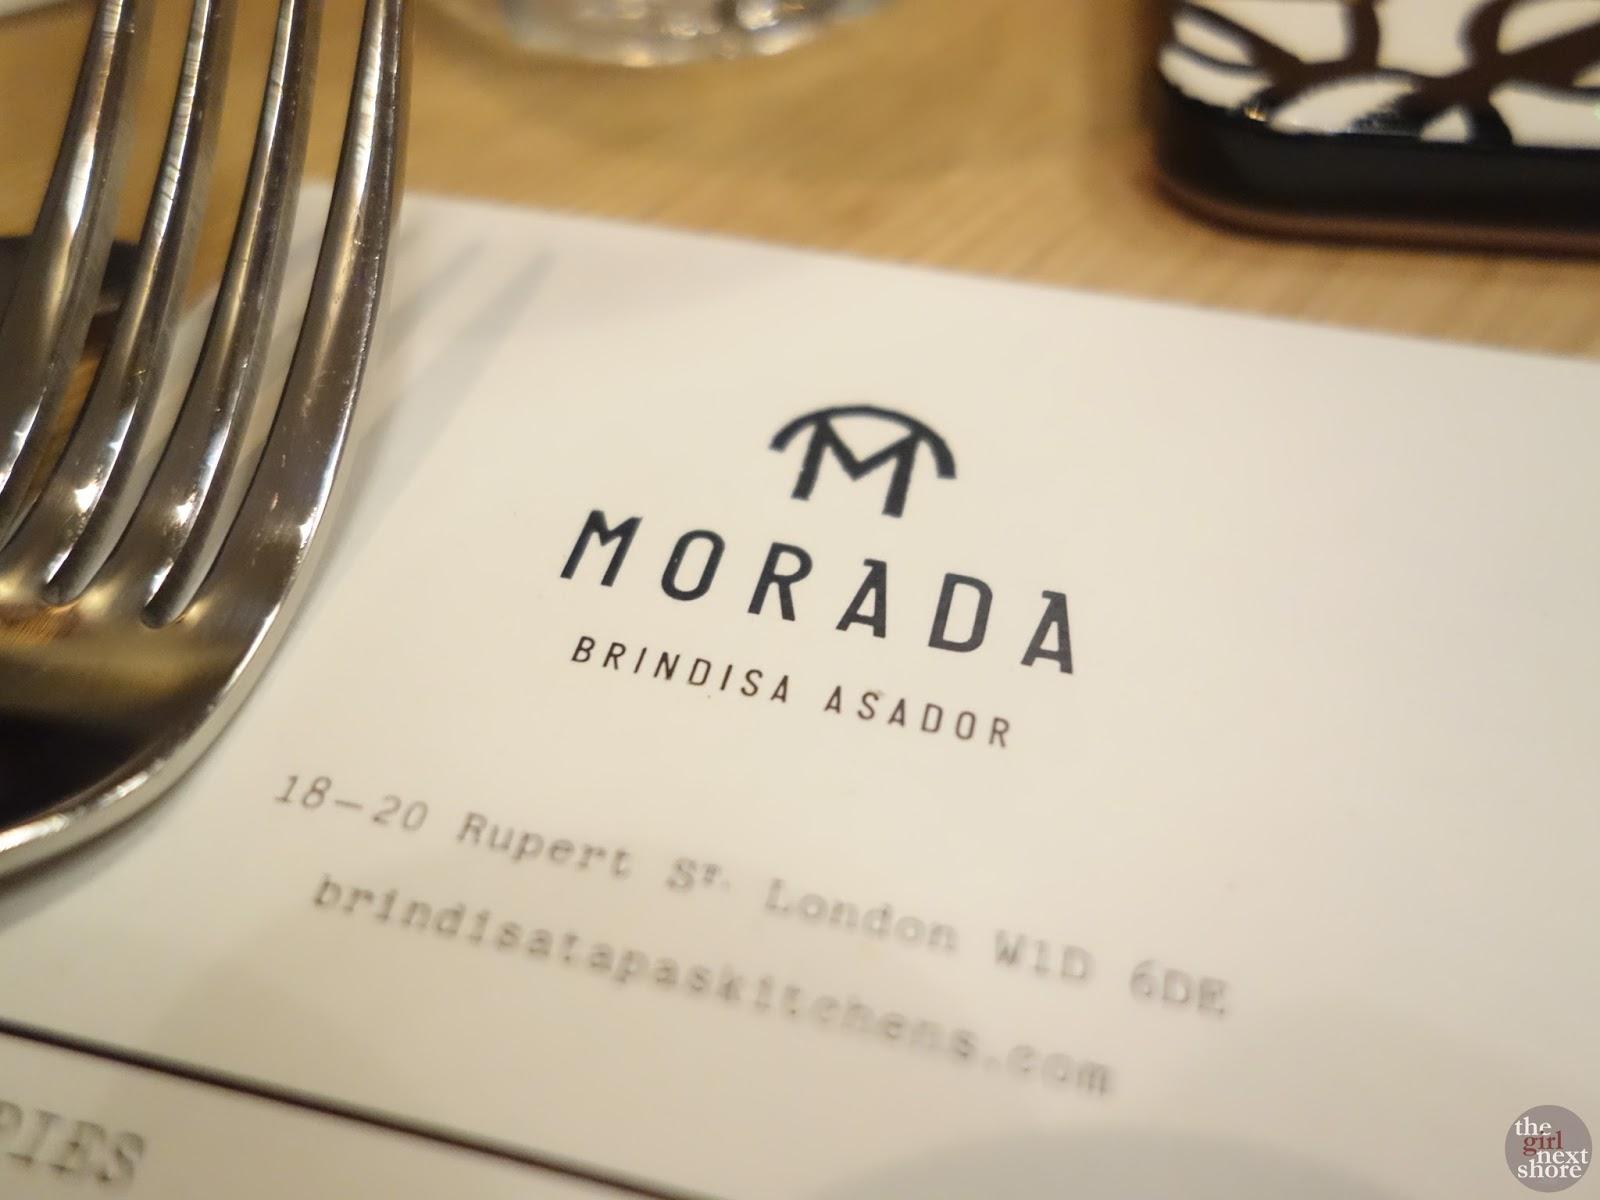 Morada Brindisa Asador (Rupert St): where Foodie Superheroes met